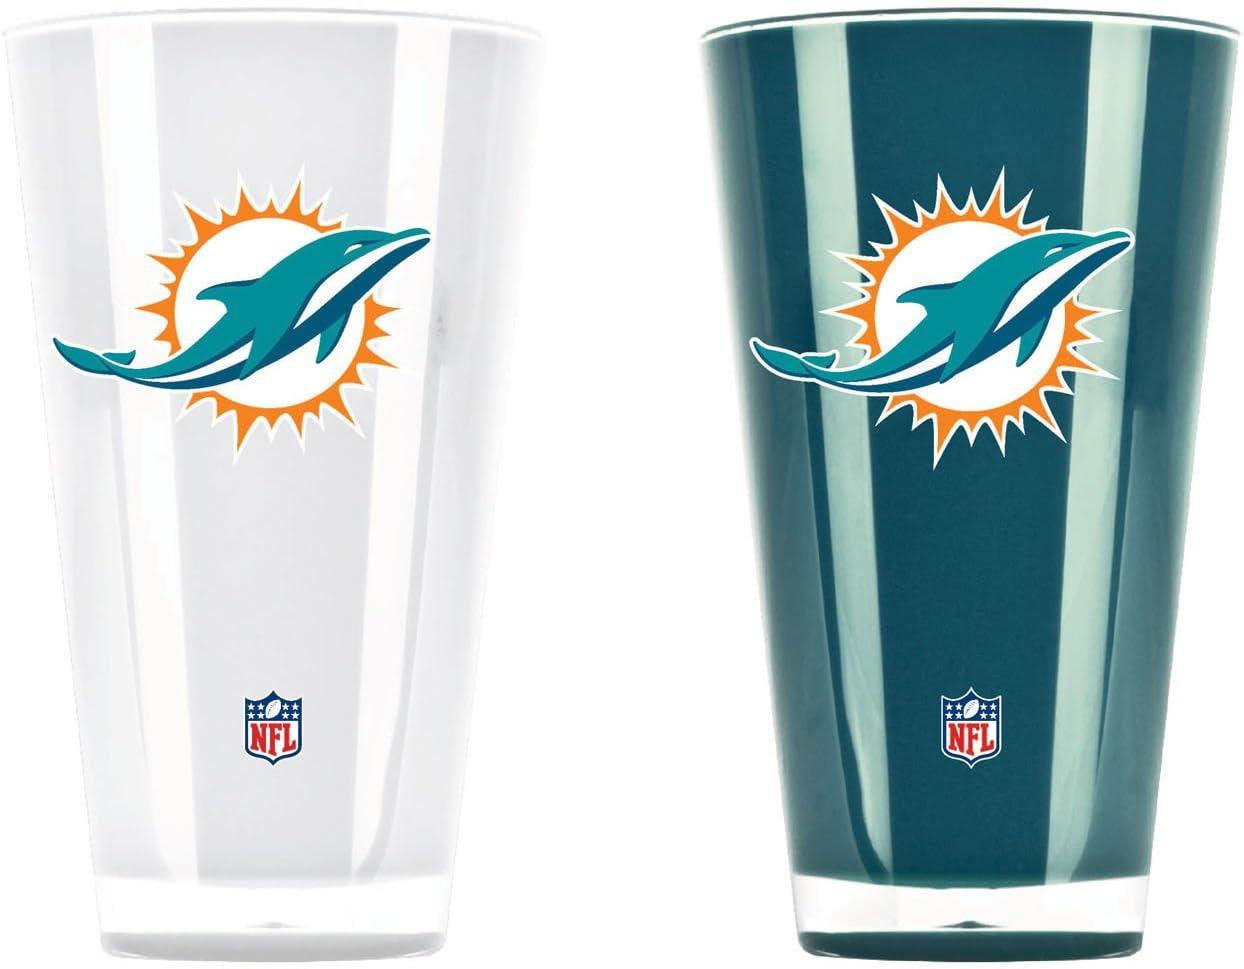 NFL Miami Dolphins 20oz Insulated Acrylic Tumbler Set of 2